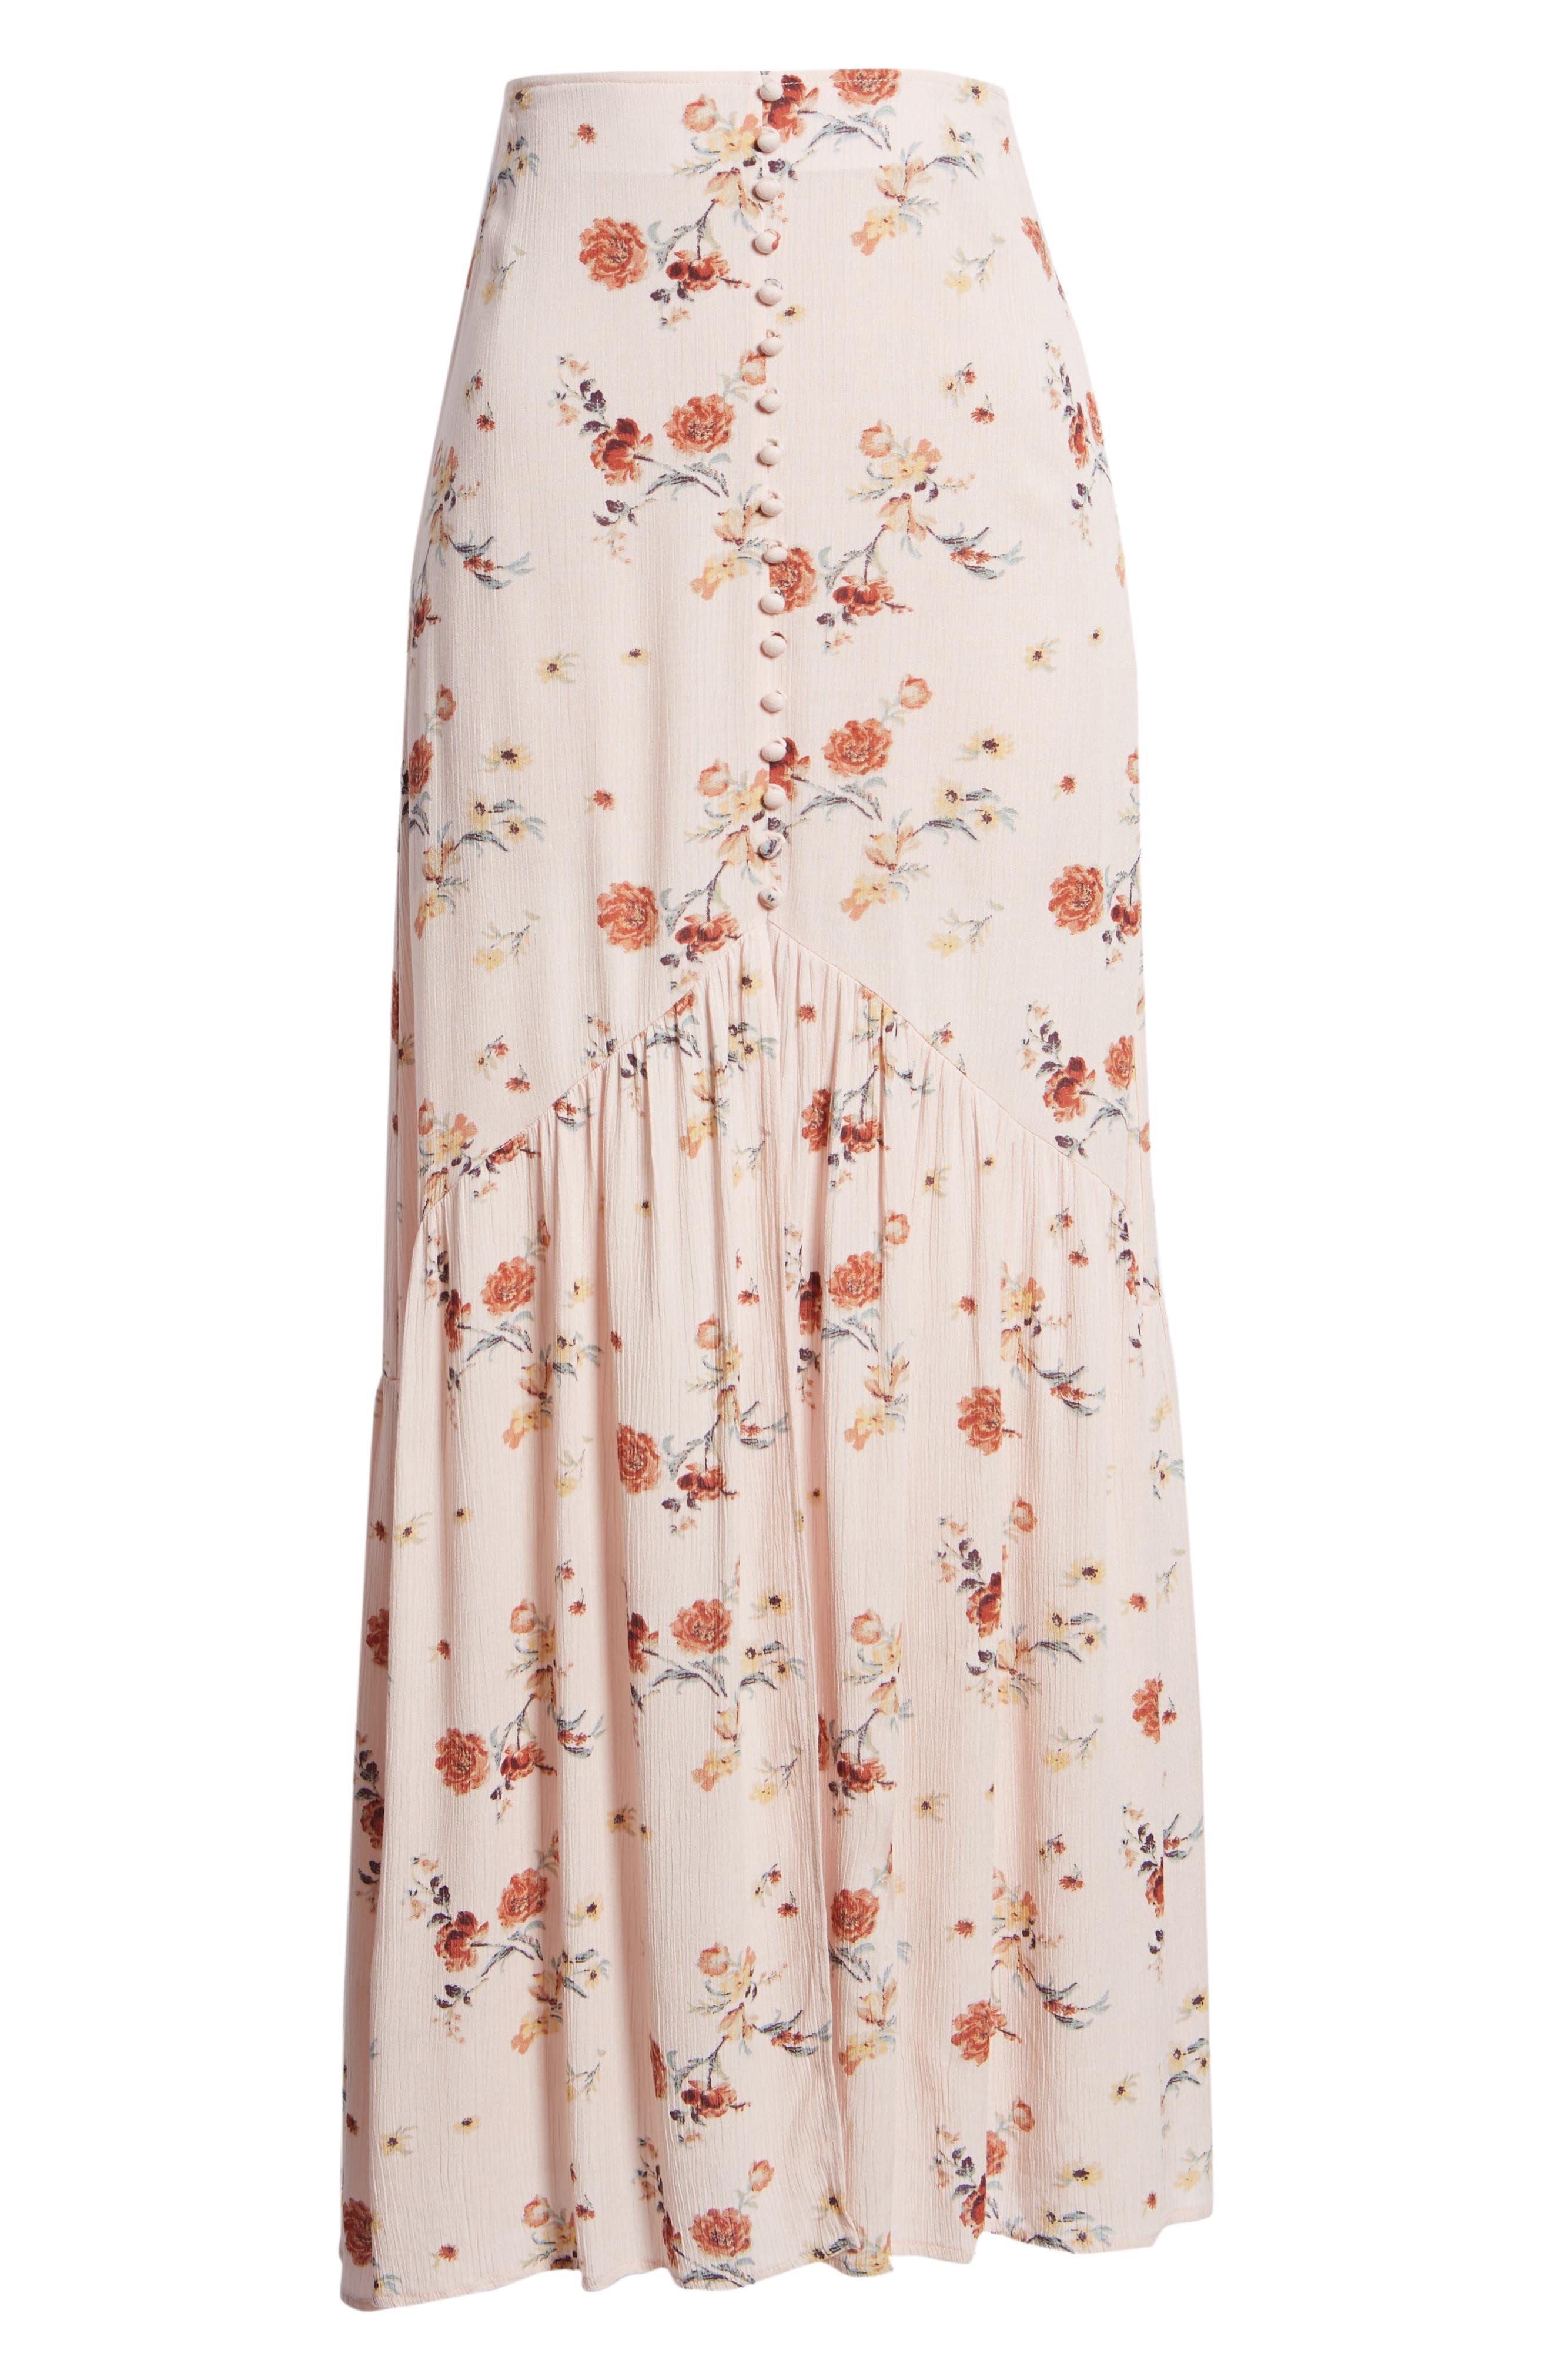 Rosa Floral Maxi Skirt,                             Alternate thumbnail 7, color,                             Pink Floral